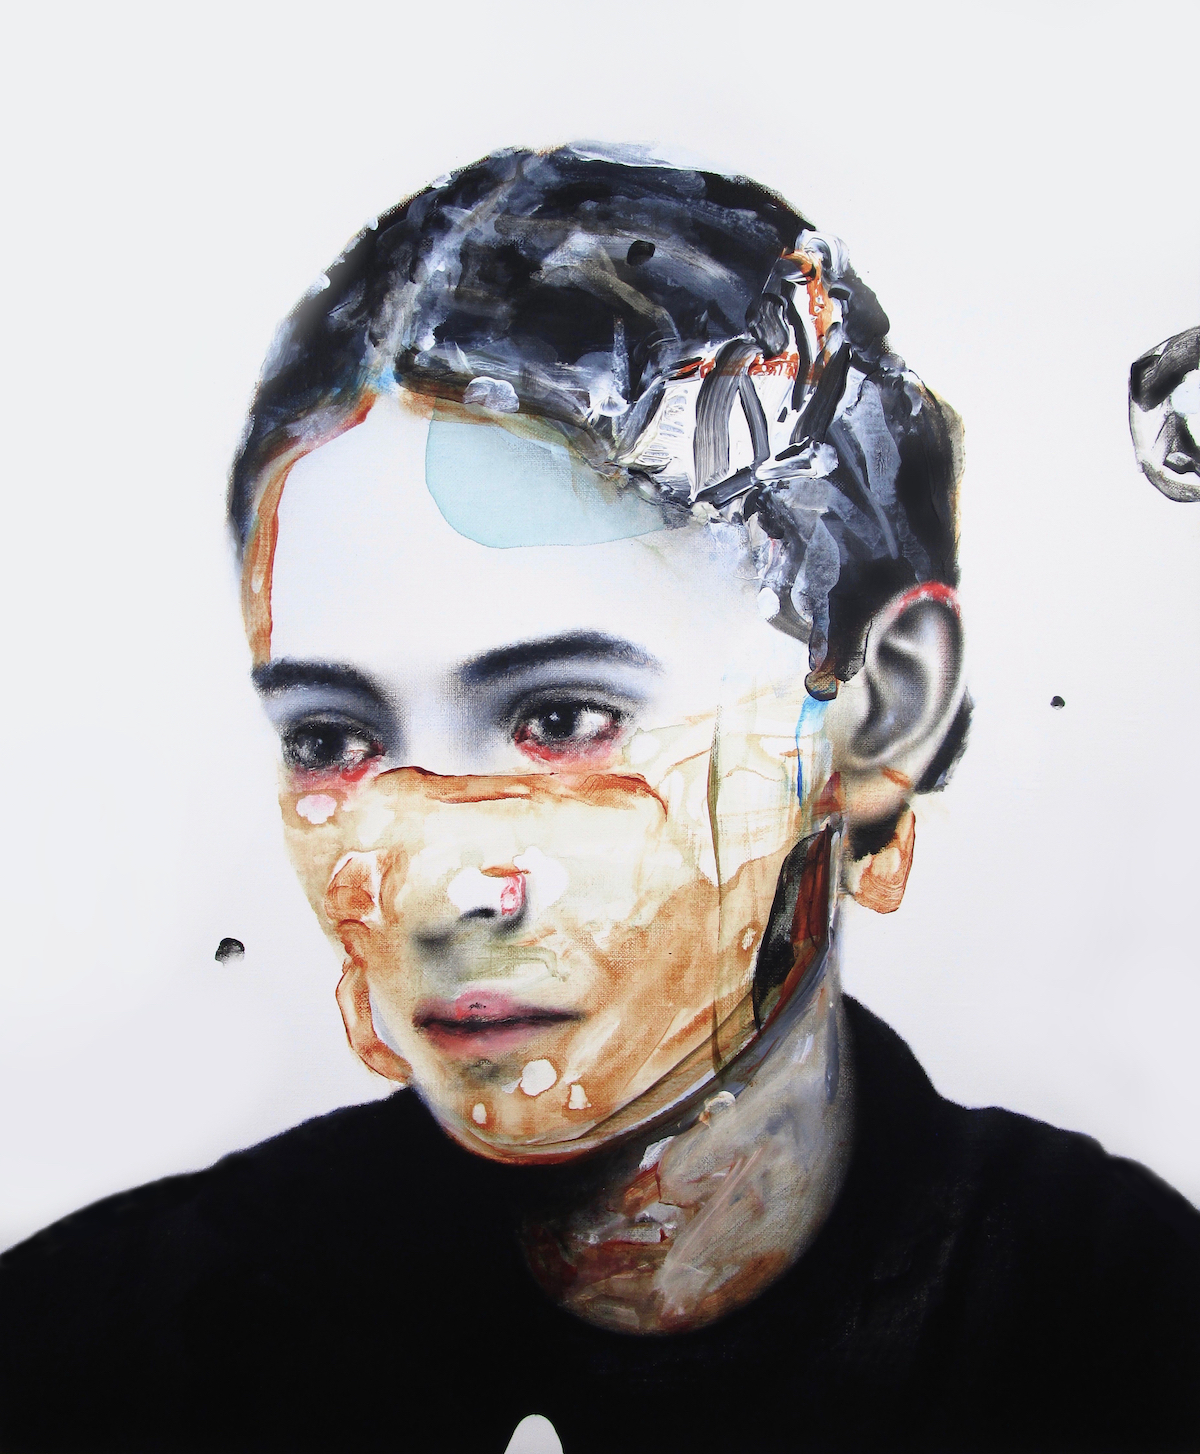 antoine cordet canvas toile peinture painting portrait art artist artiste peintre acrylic oil the habit of losing life